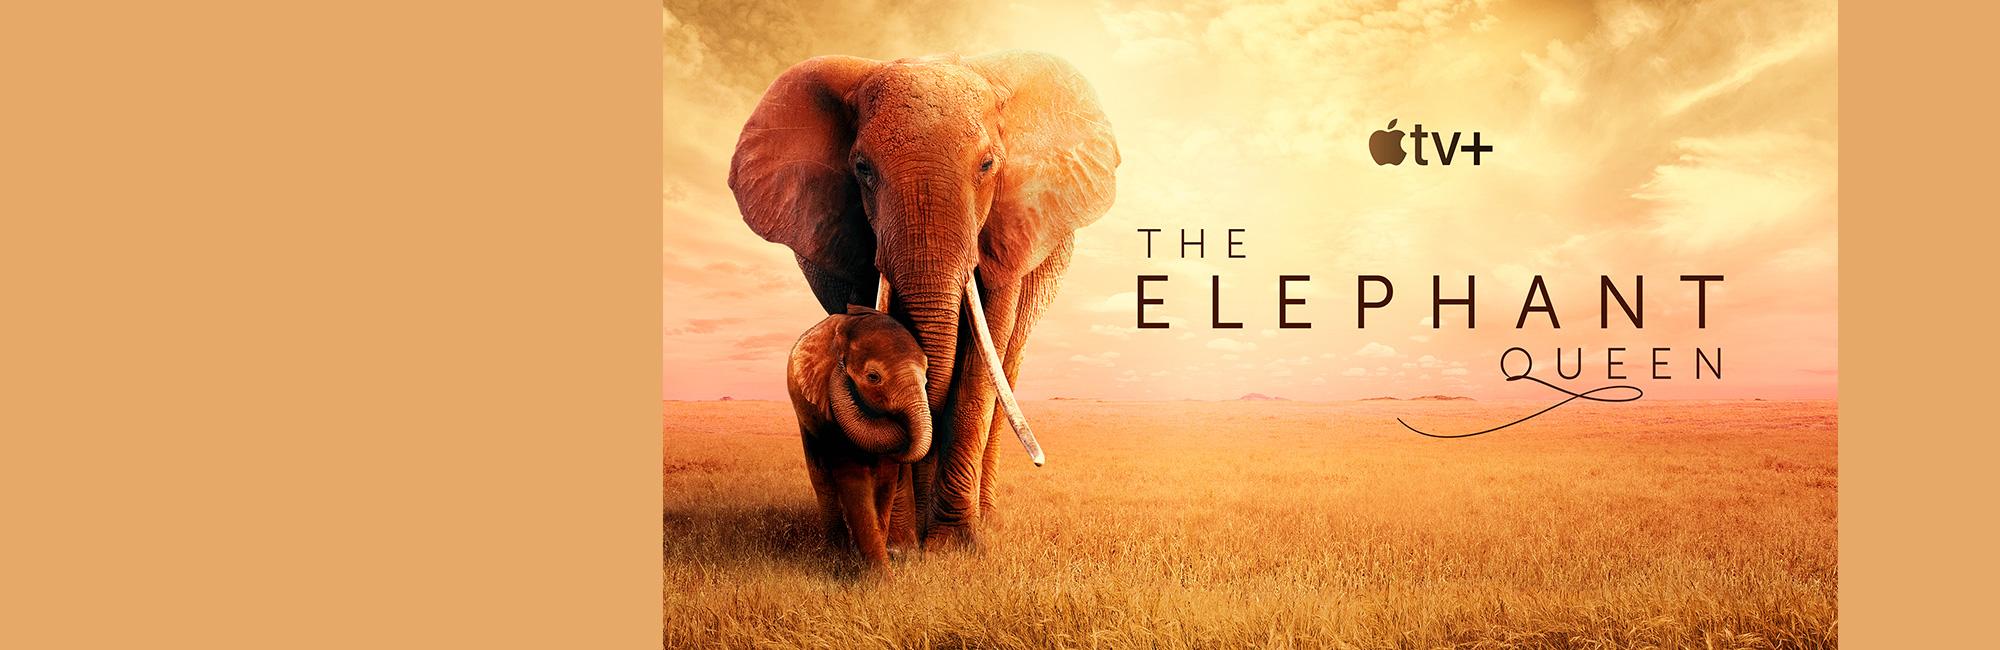 The-Elephant-Queen-Final2